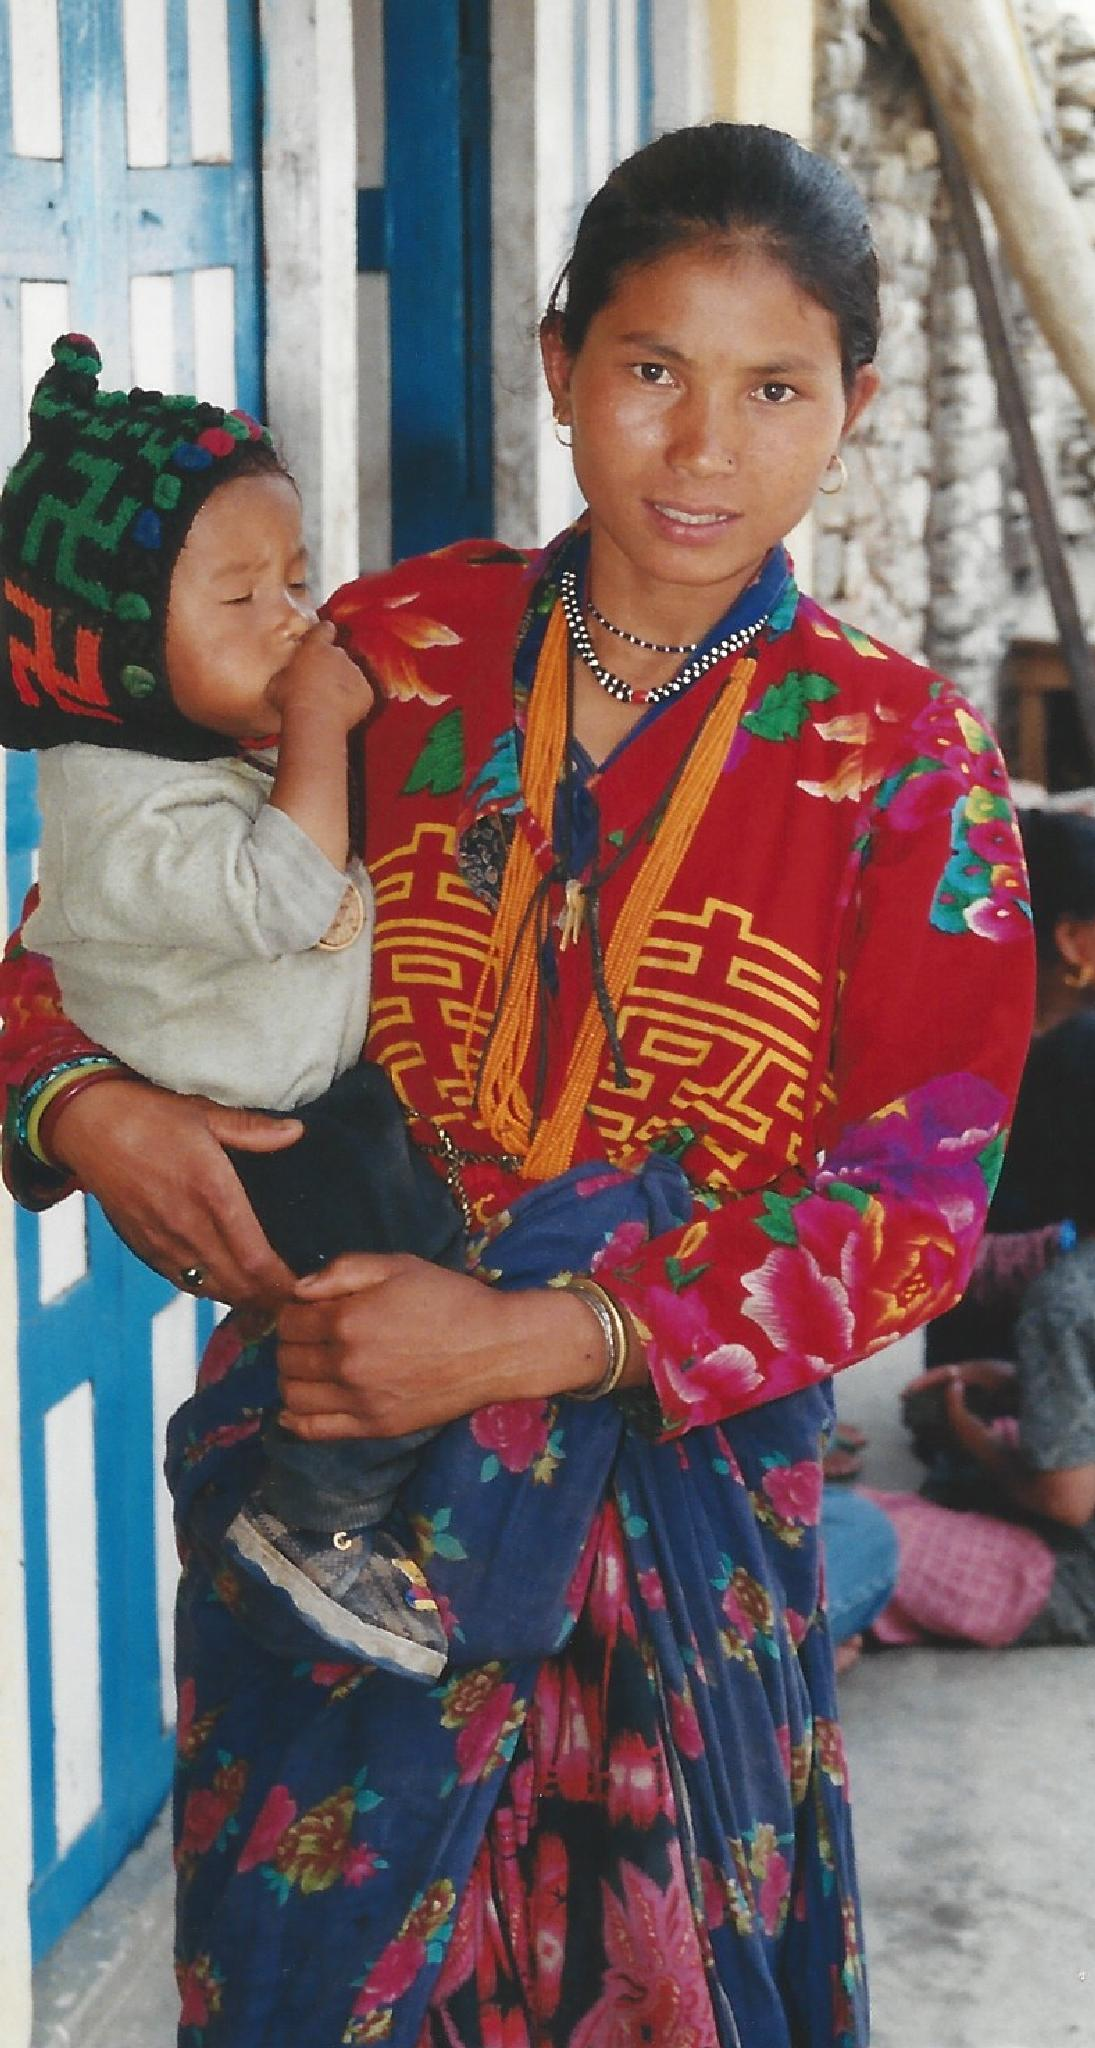 Young Nepali Mother by Scott F. Brooks